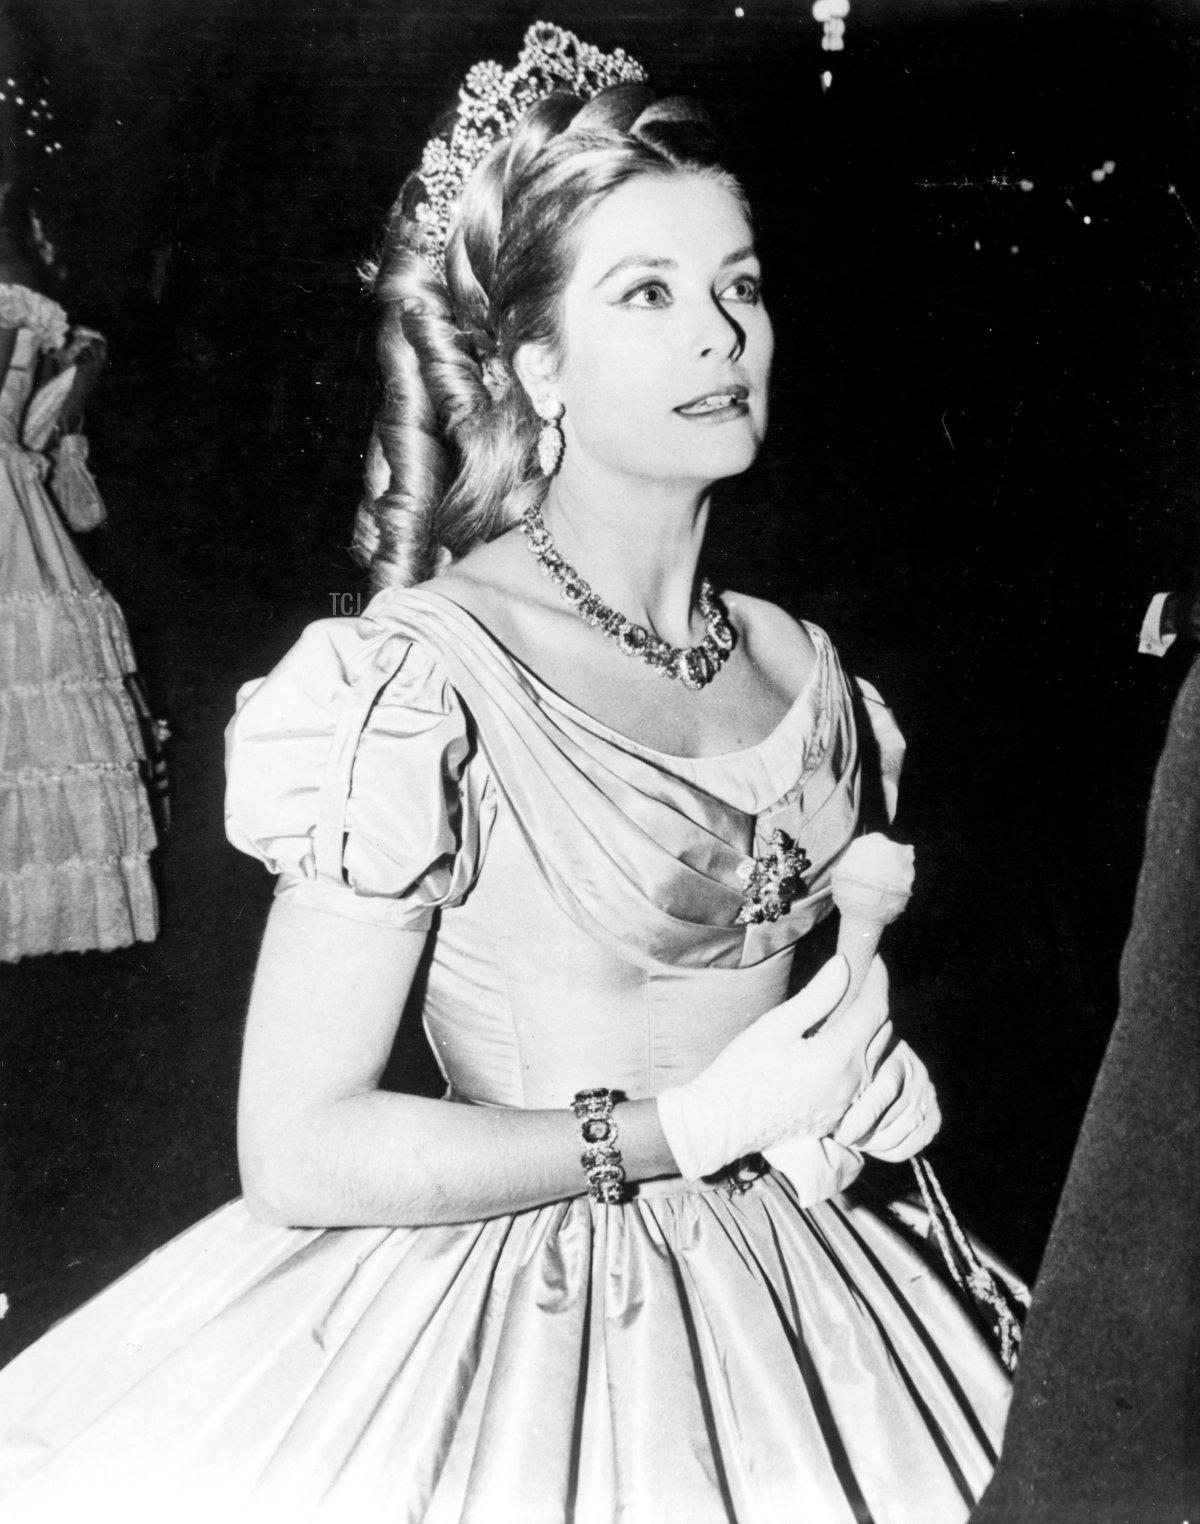 Princess Grace of Monaco wears a diamond floral tiara at the Century Ball, celebrating Monte-Carlo's 100th anniversary, May 1966